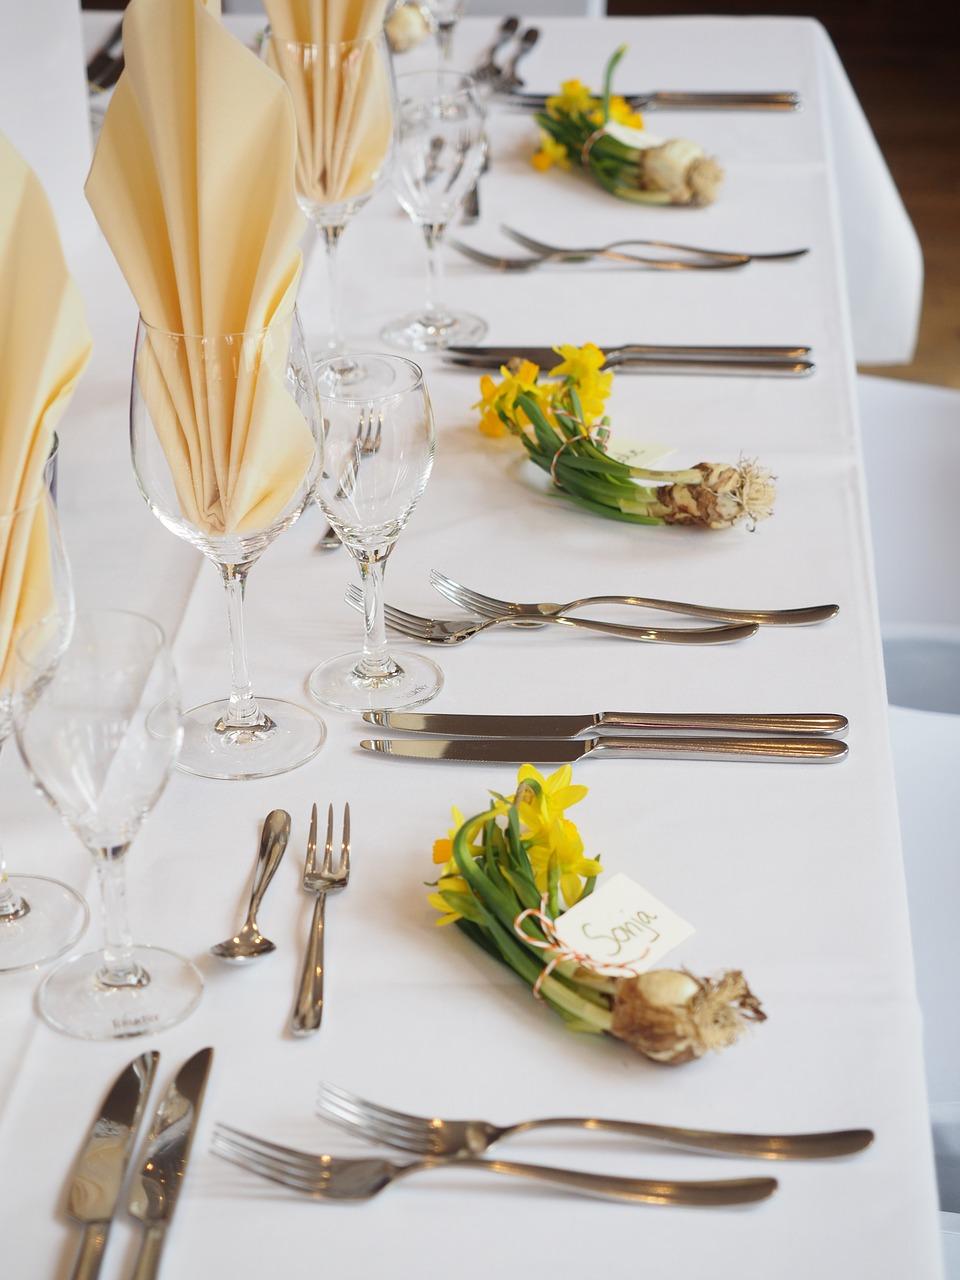 cutlery-1174140_1280